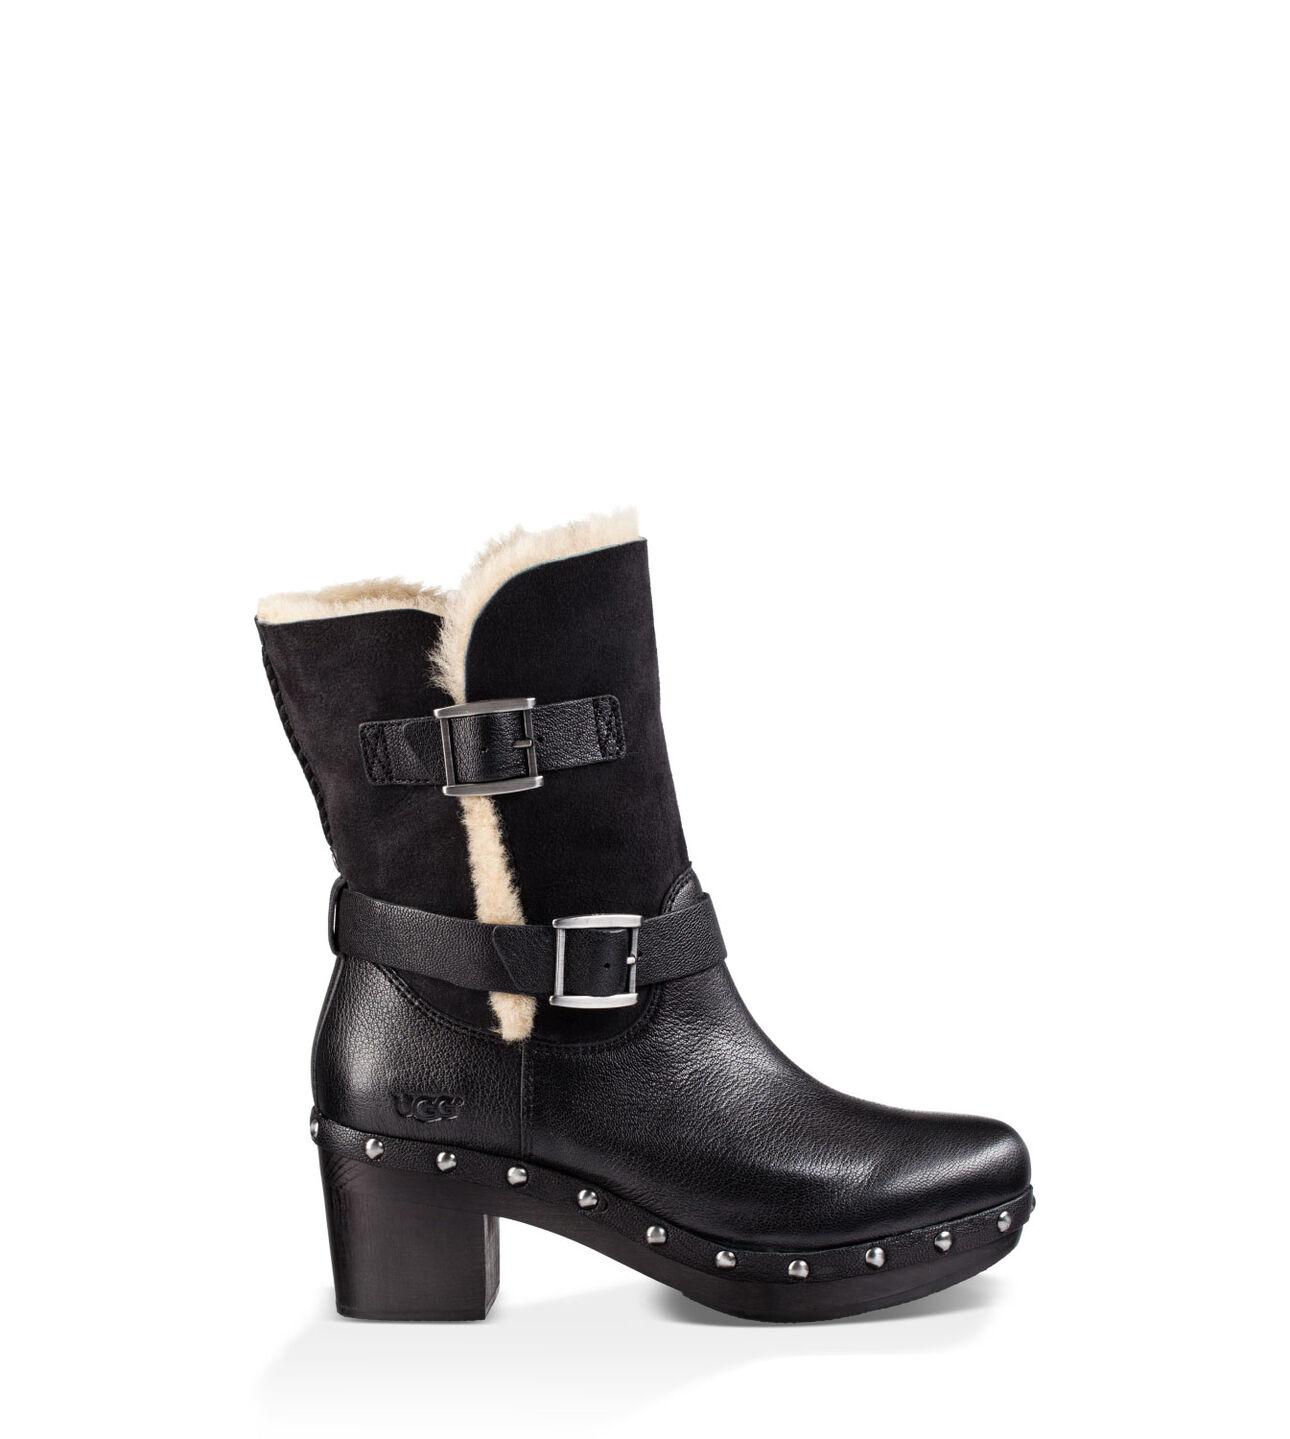 8b885c16f93 Brea Leather